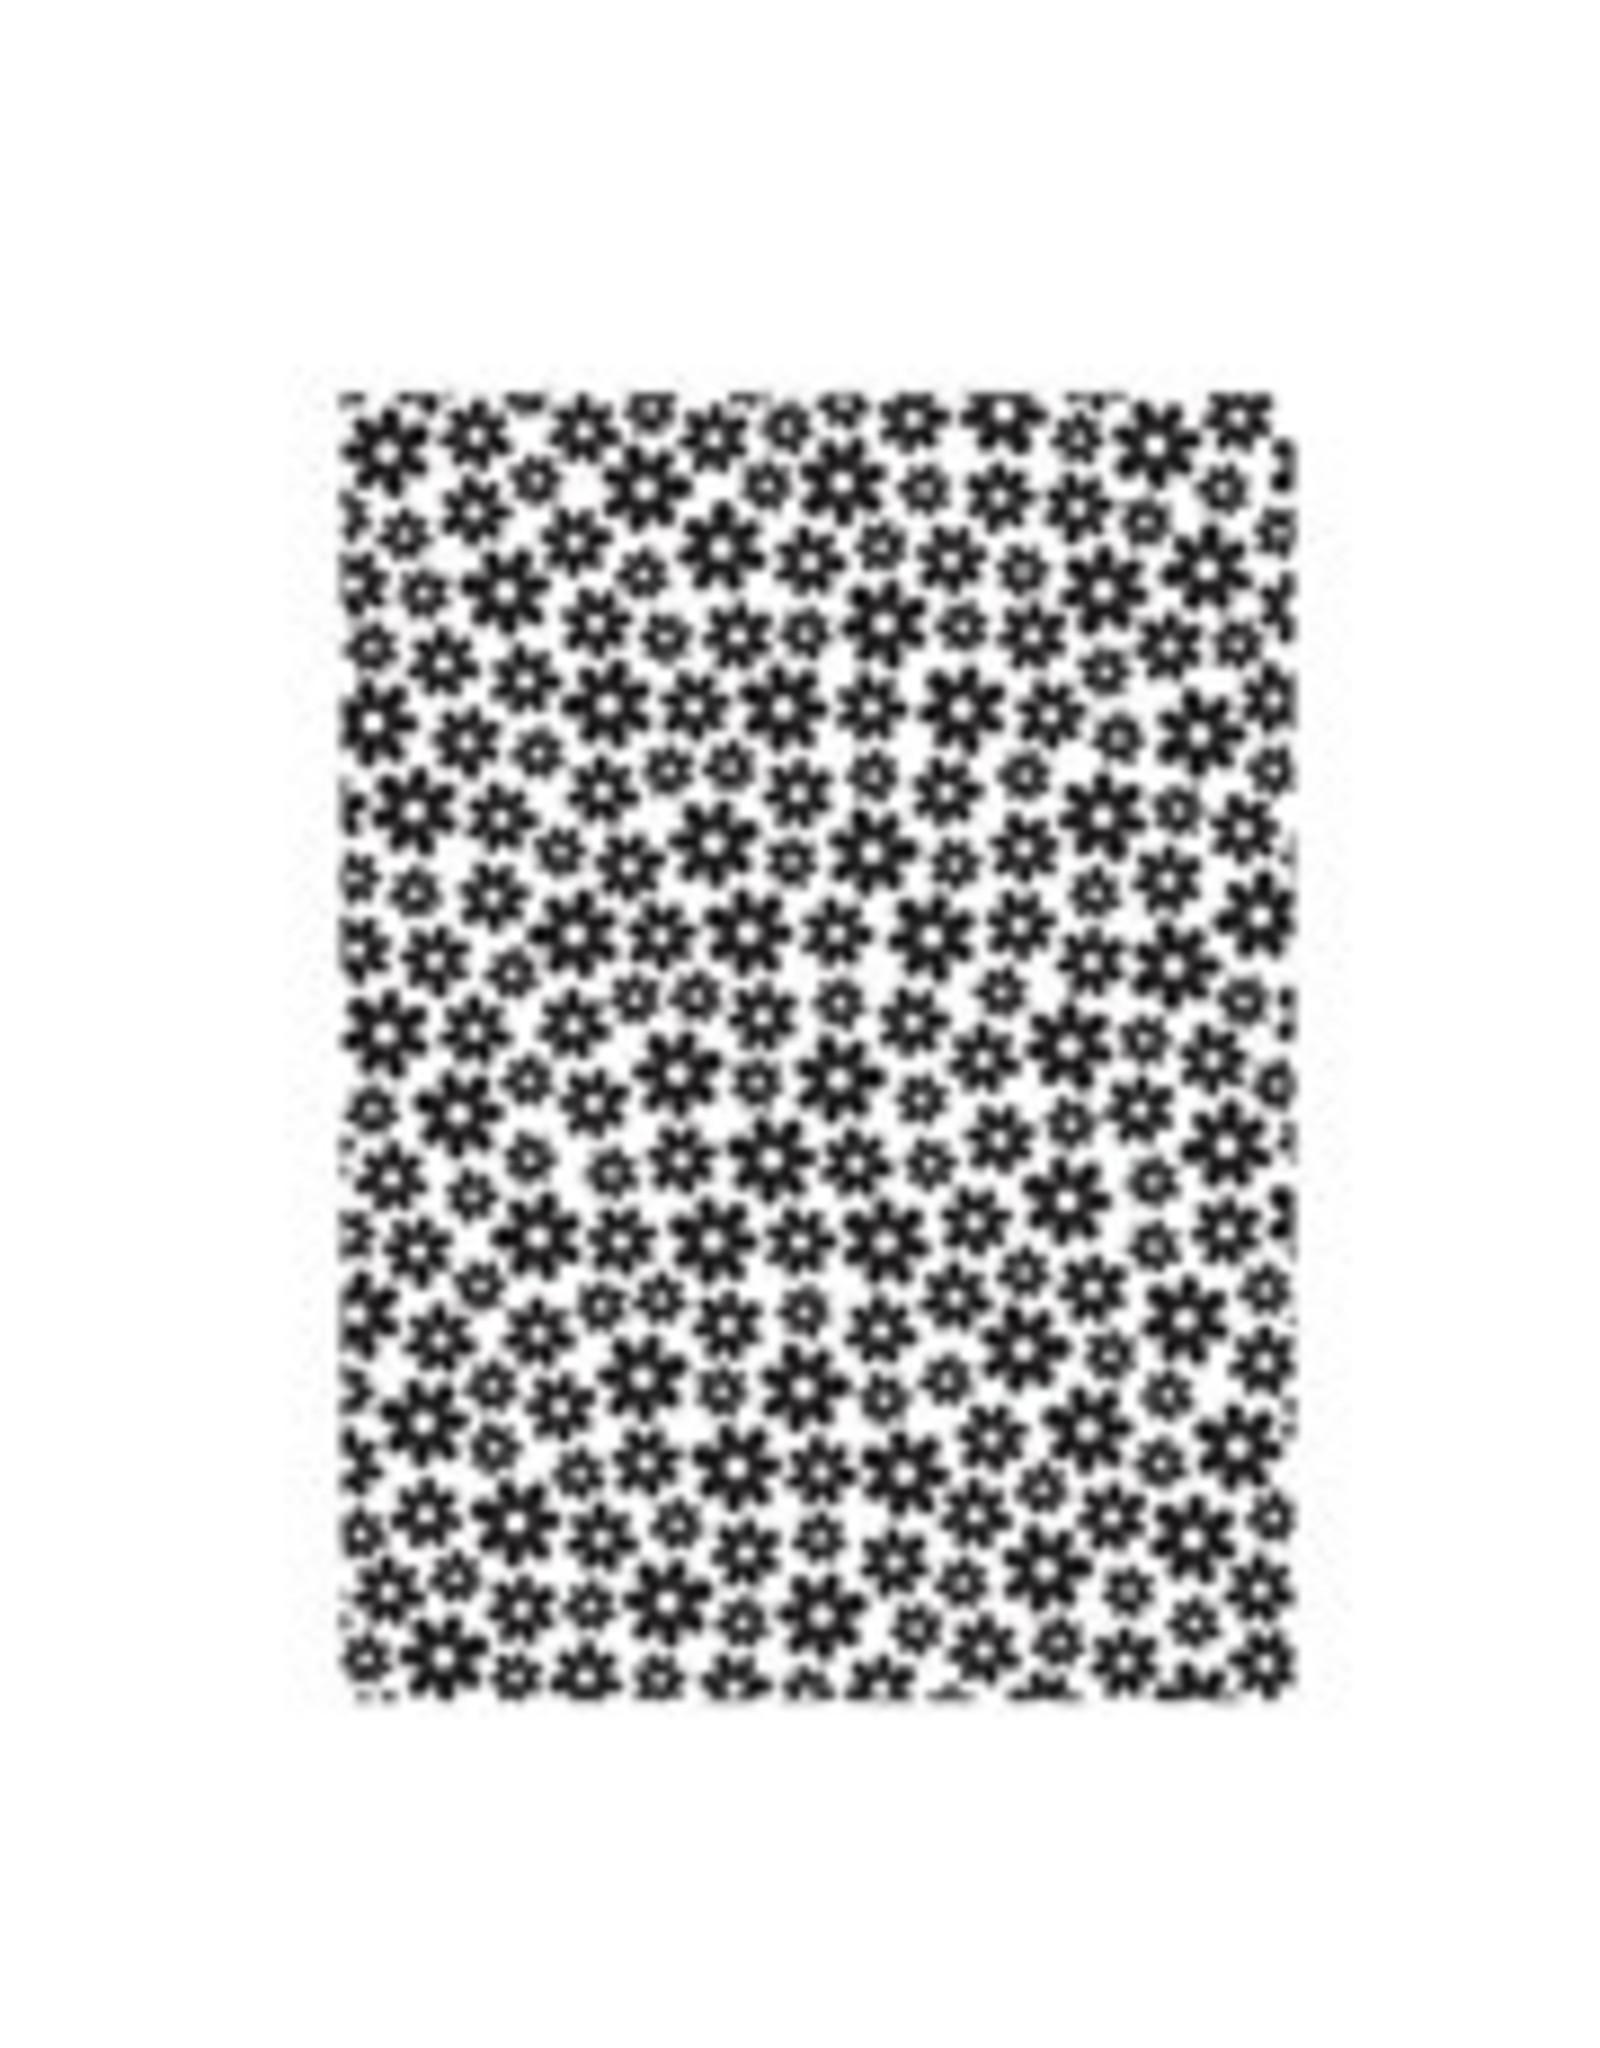 Mini Daisy - Embossing Folder